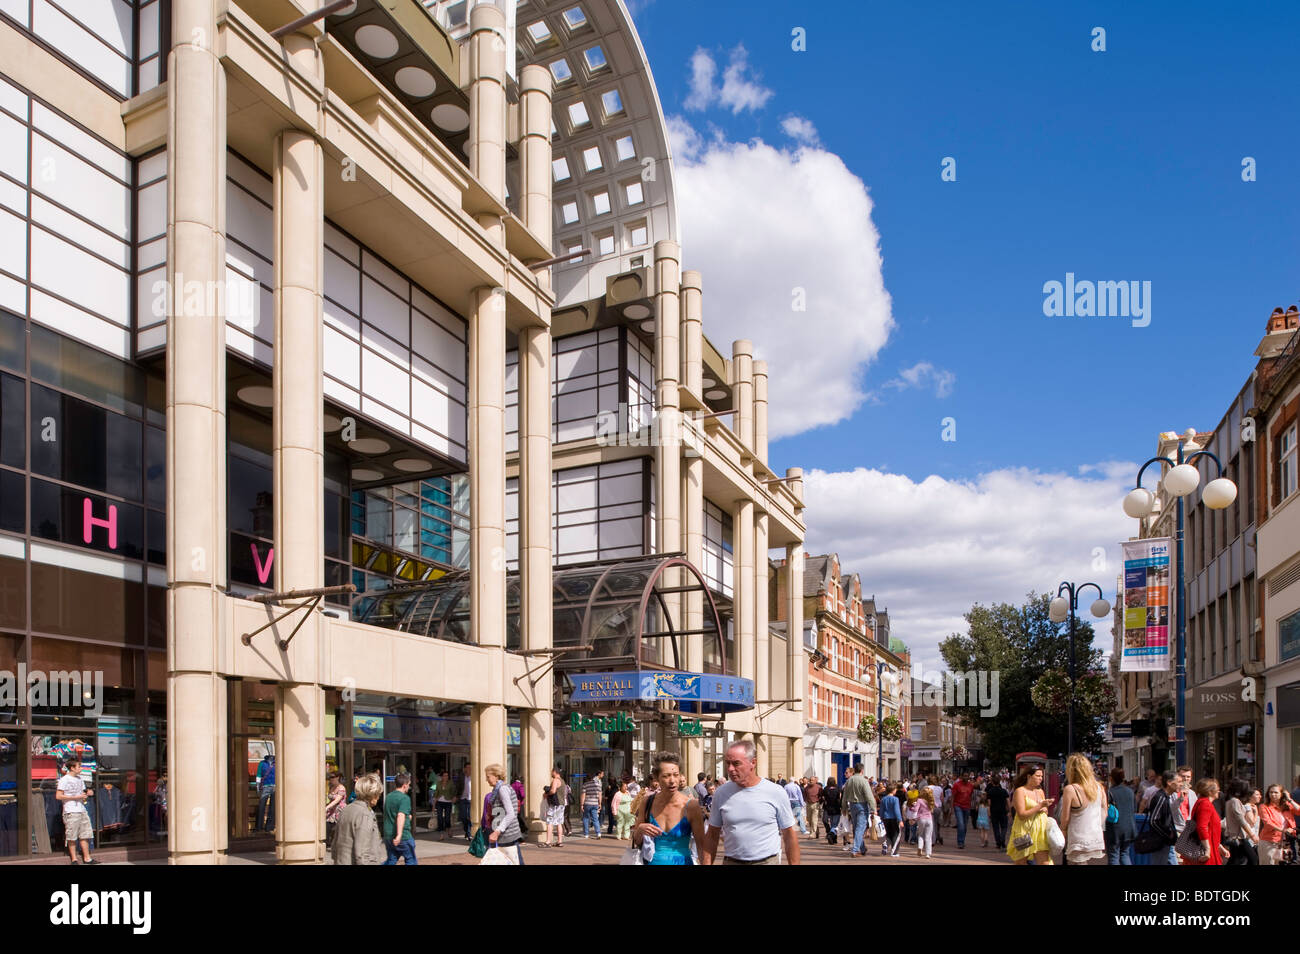 People shopping Kingston upon Thames, Surrey, United Kingdom - Stock Image